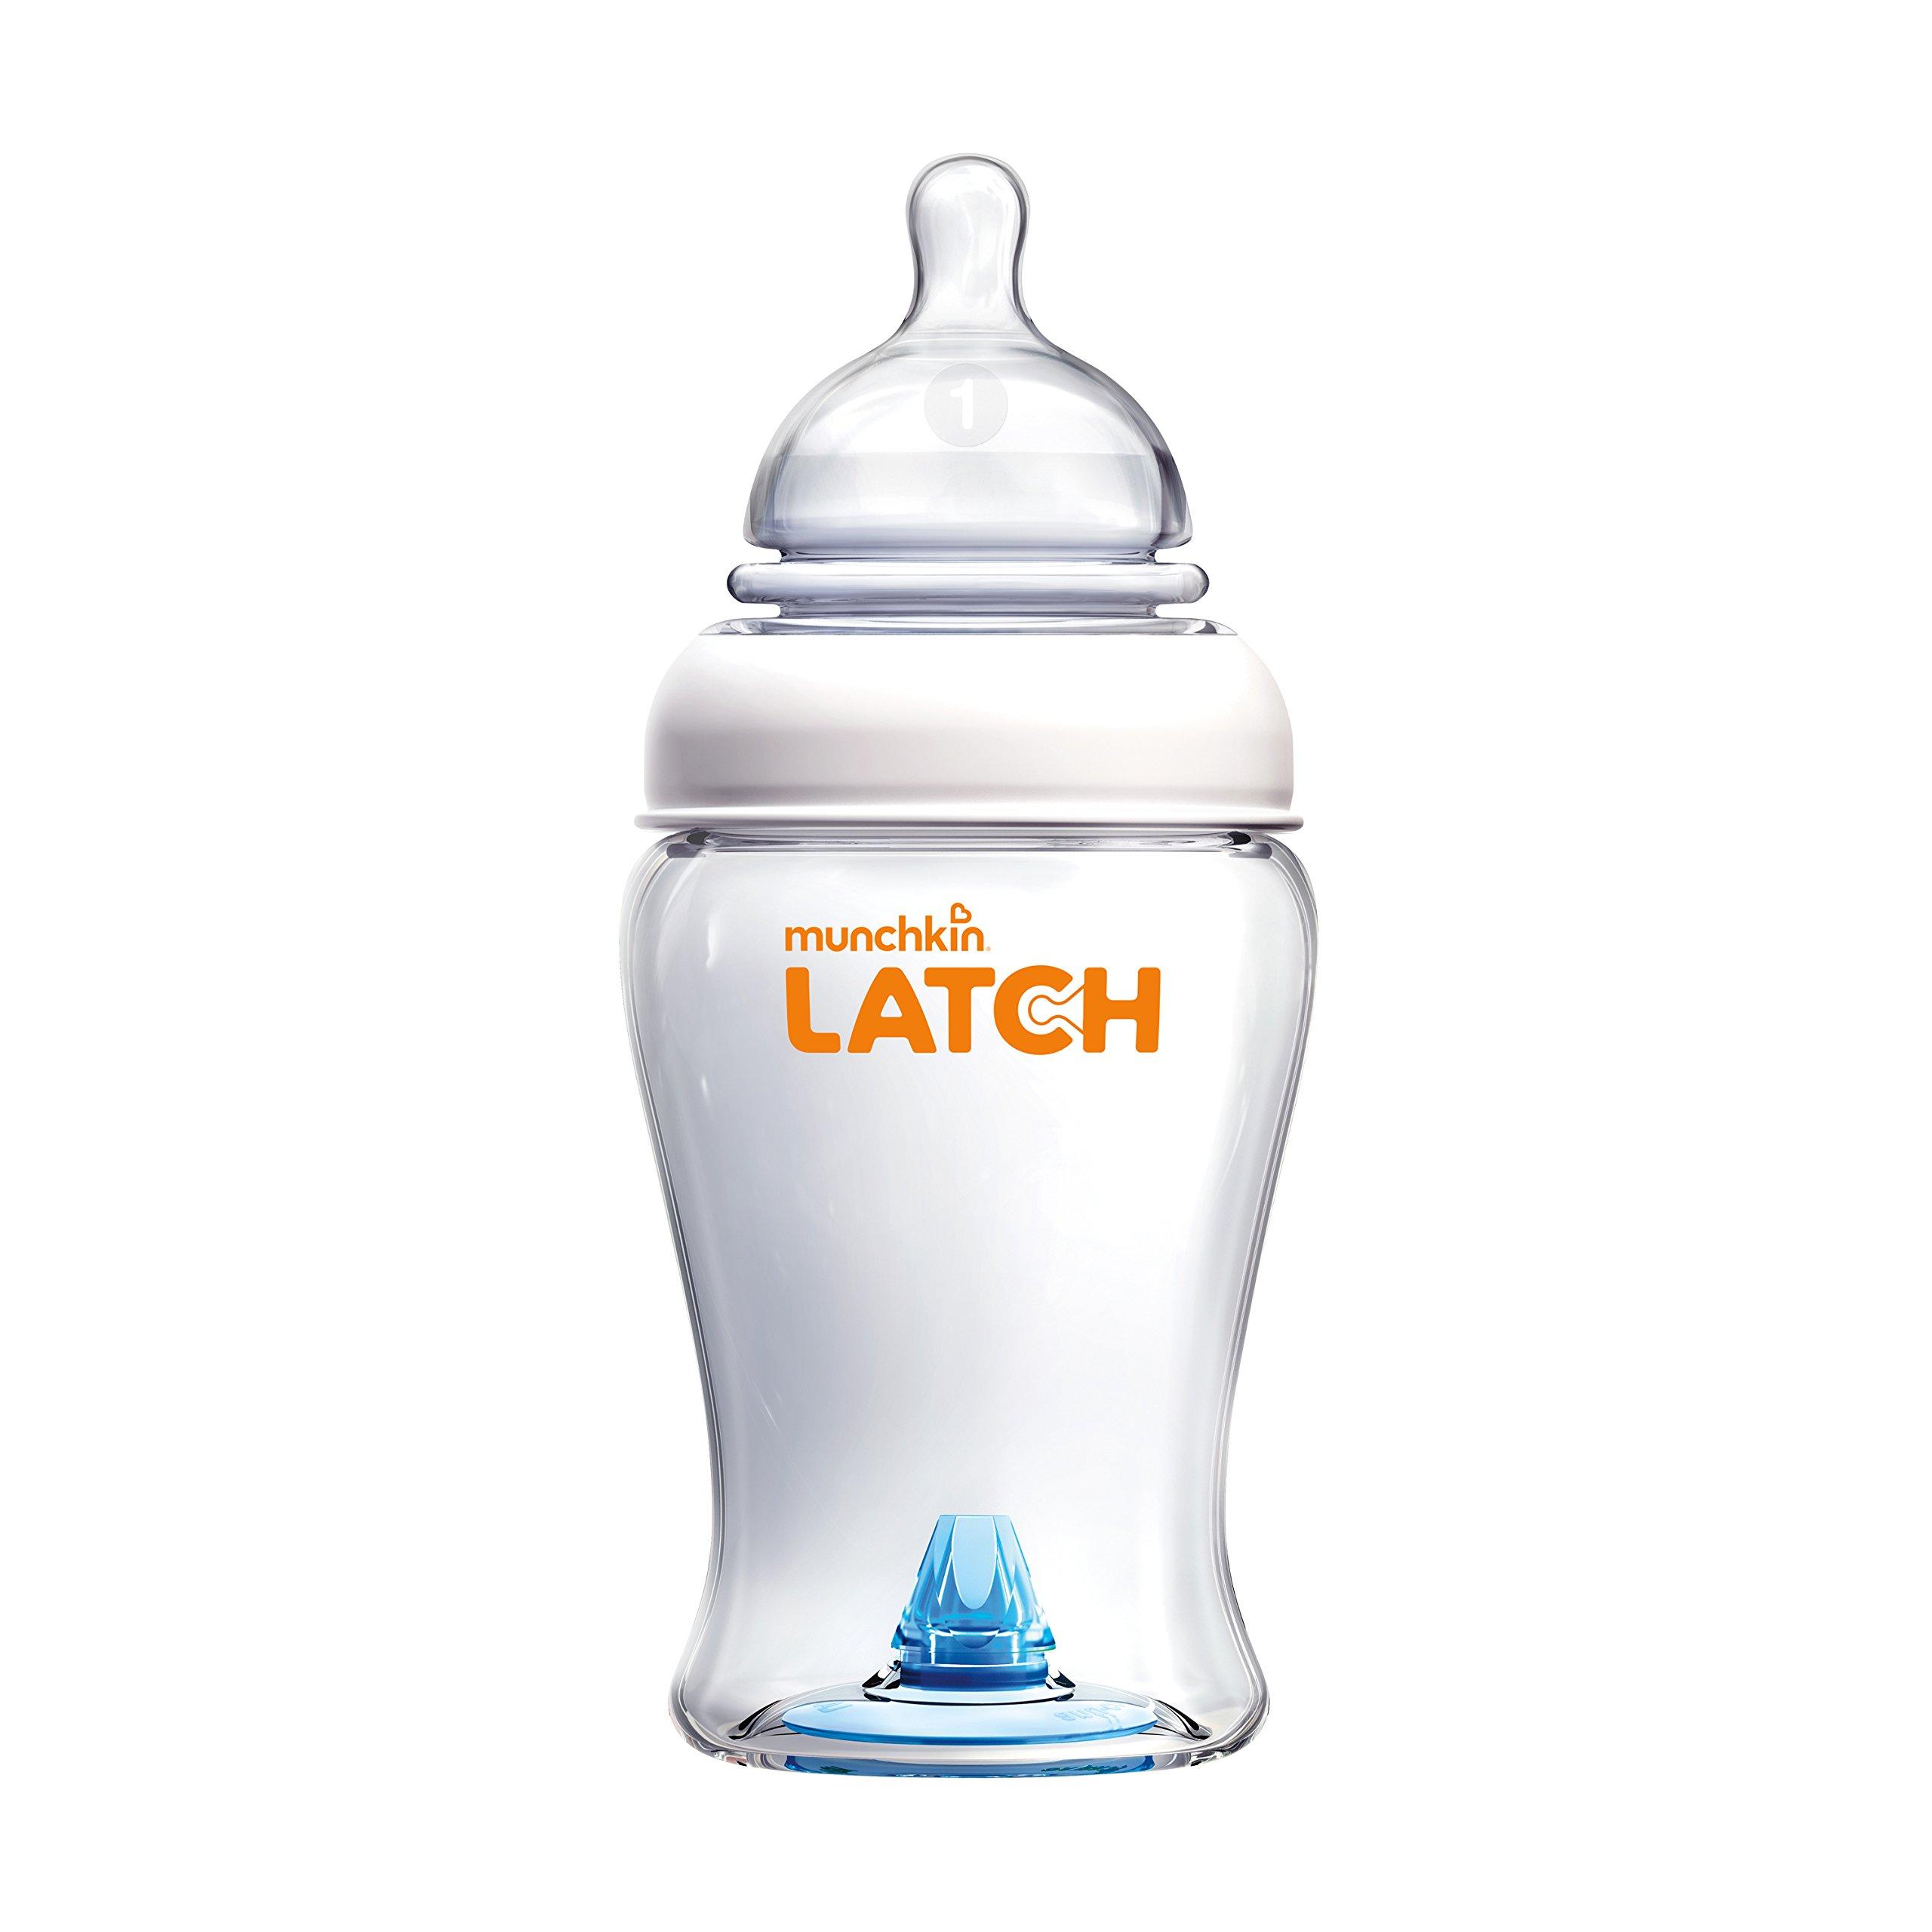 Munchkin Latch BPA-Free Baby Bottle, 8 Ounce, 1 Pack